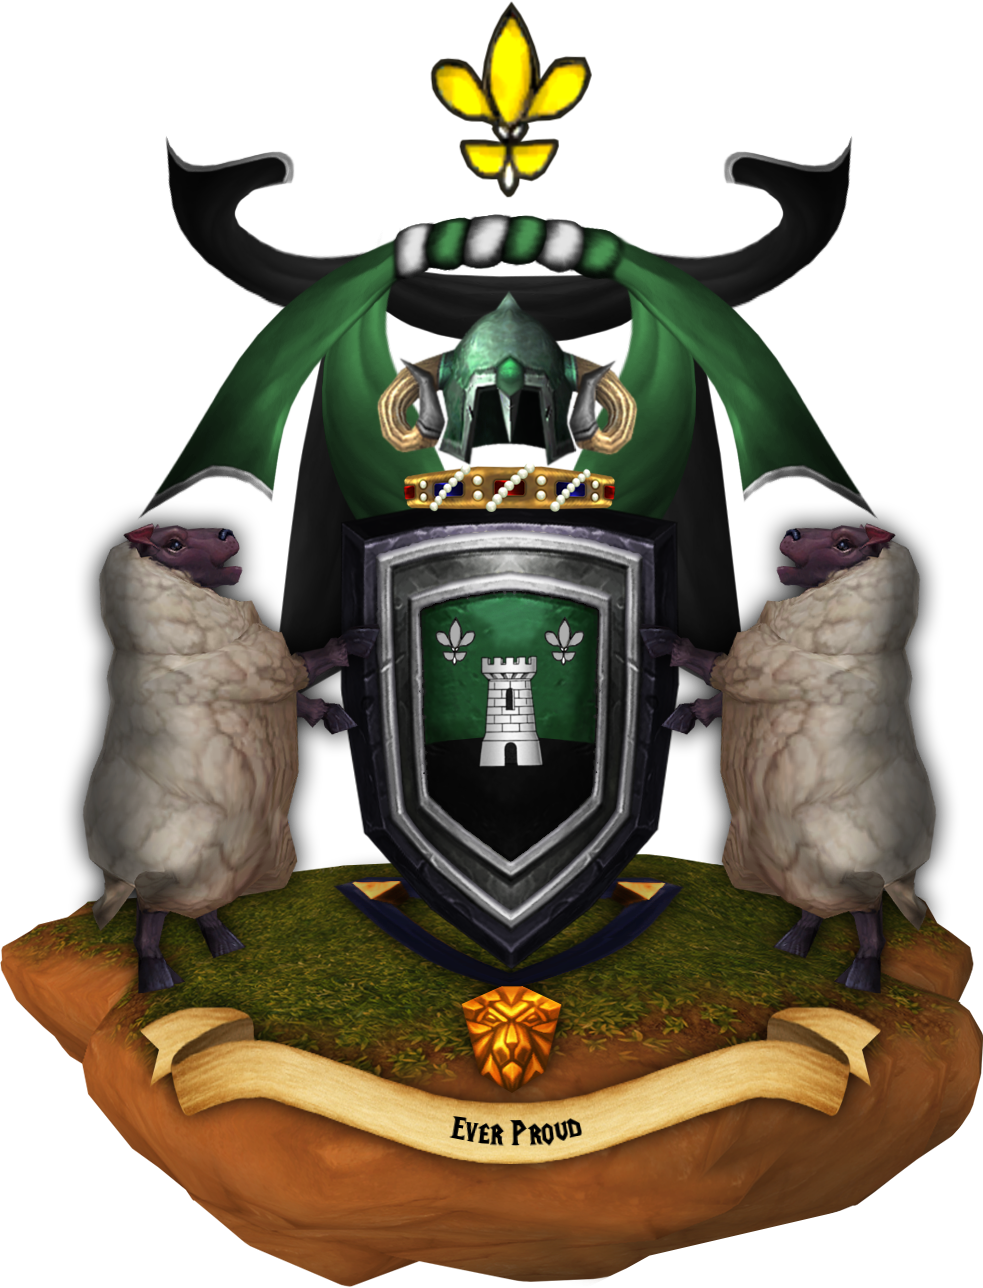 Tfr heraldry lyon.png